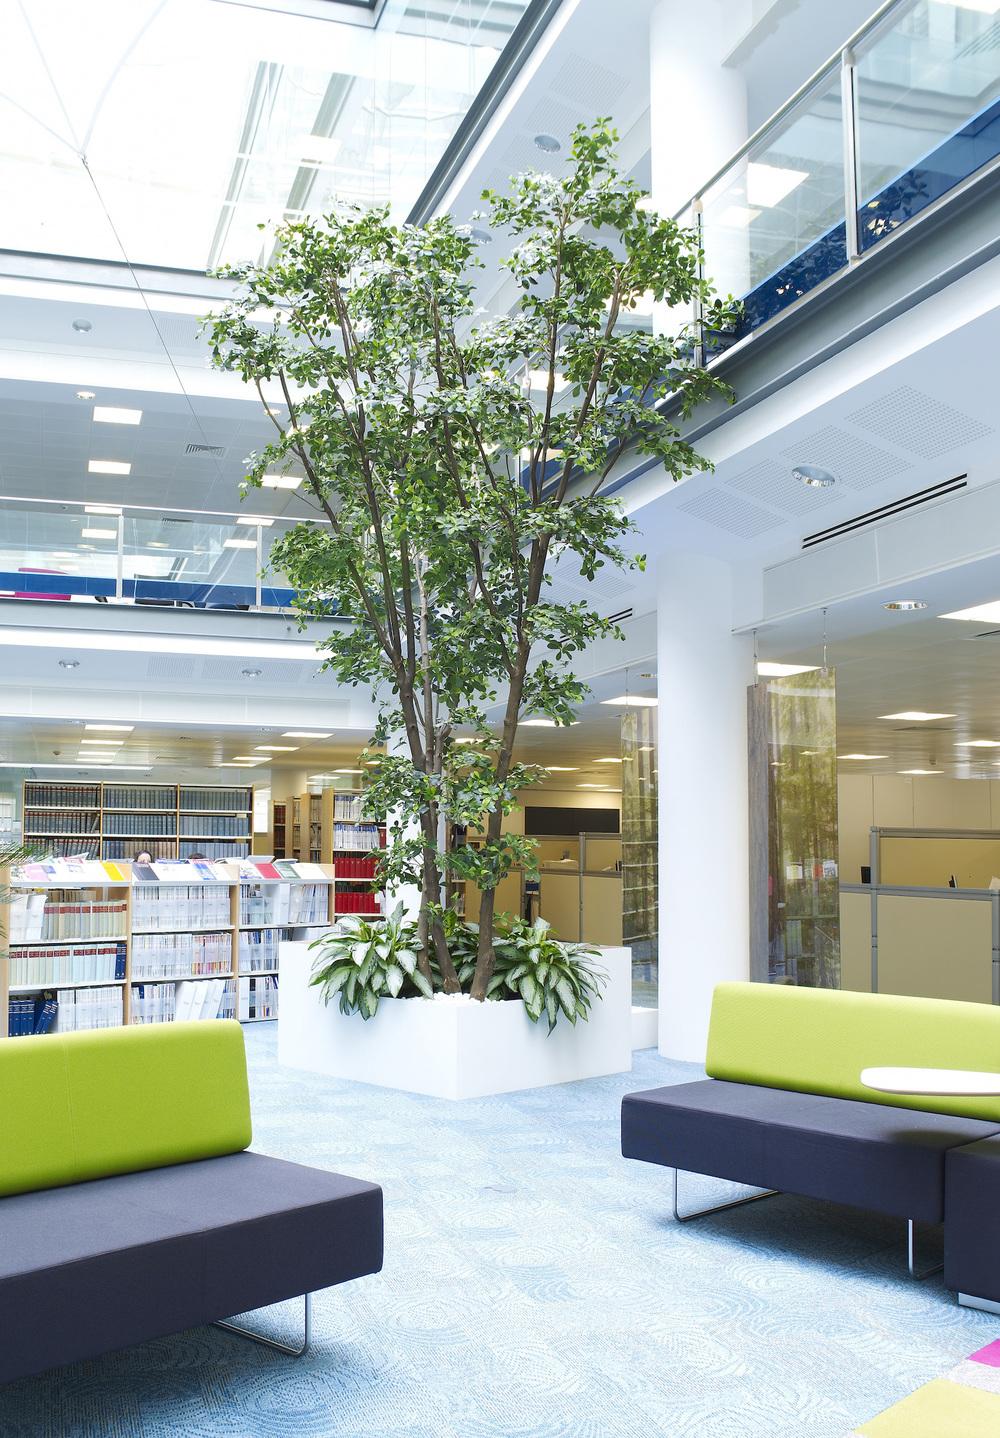 dac-beachcroft-plantcare-interior-plants-trees-bristol-image-1